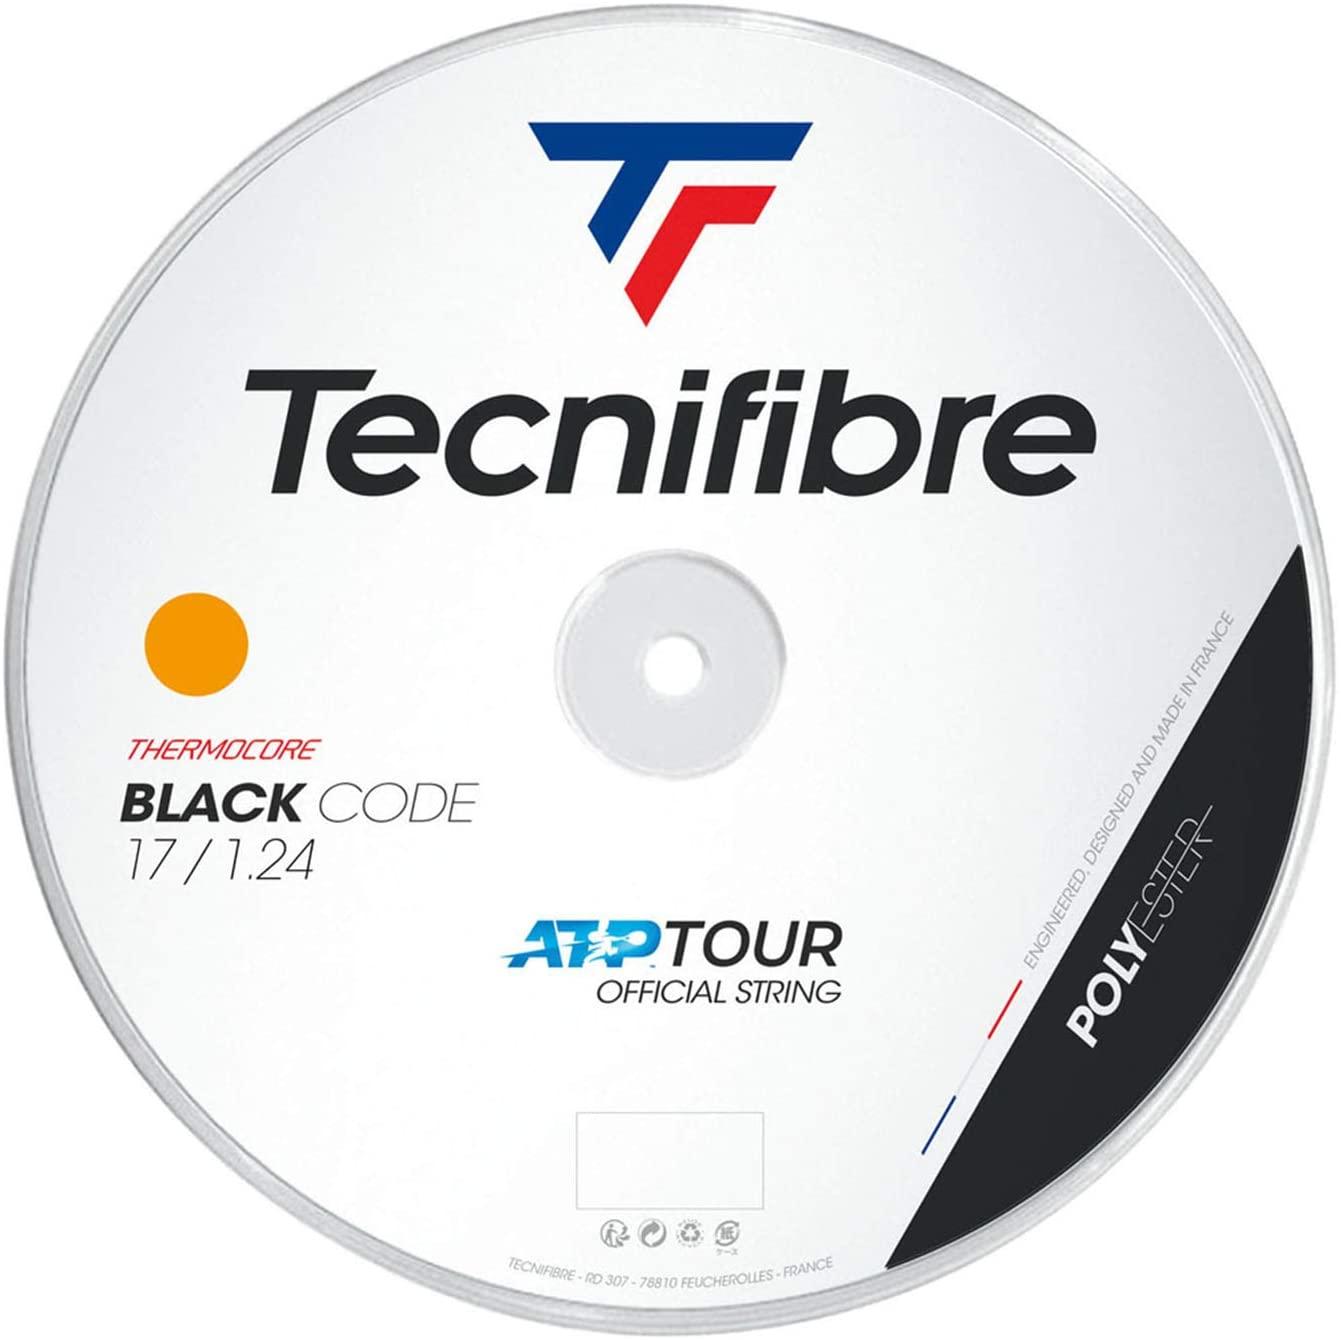 Tecnifibre Black Code 17G (1.24mm) Tennis String 200m Reel - Fire